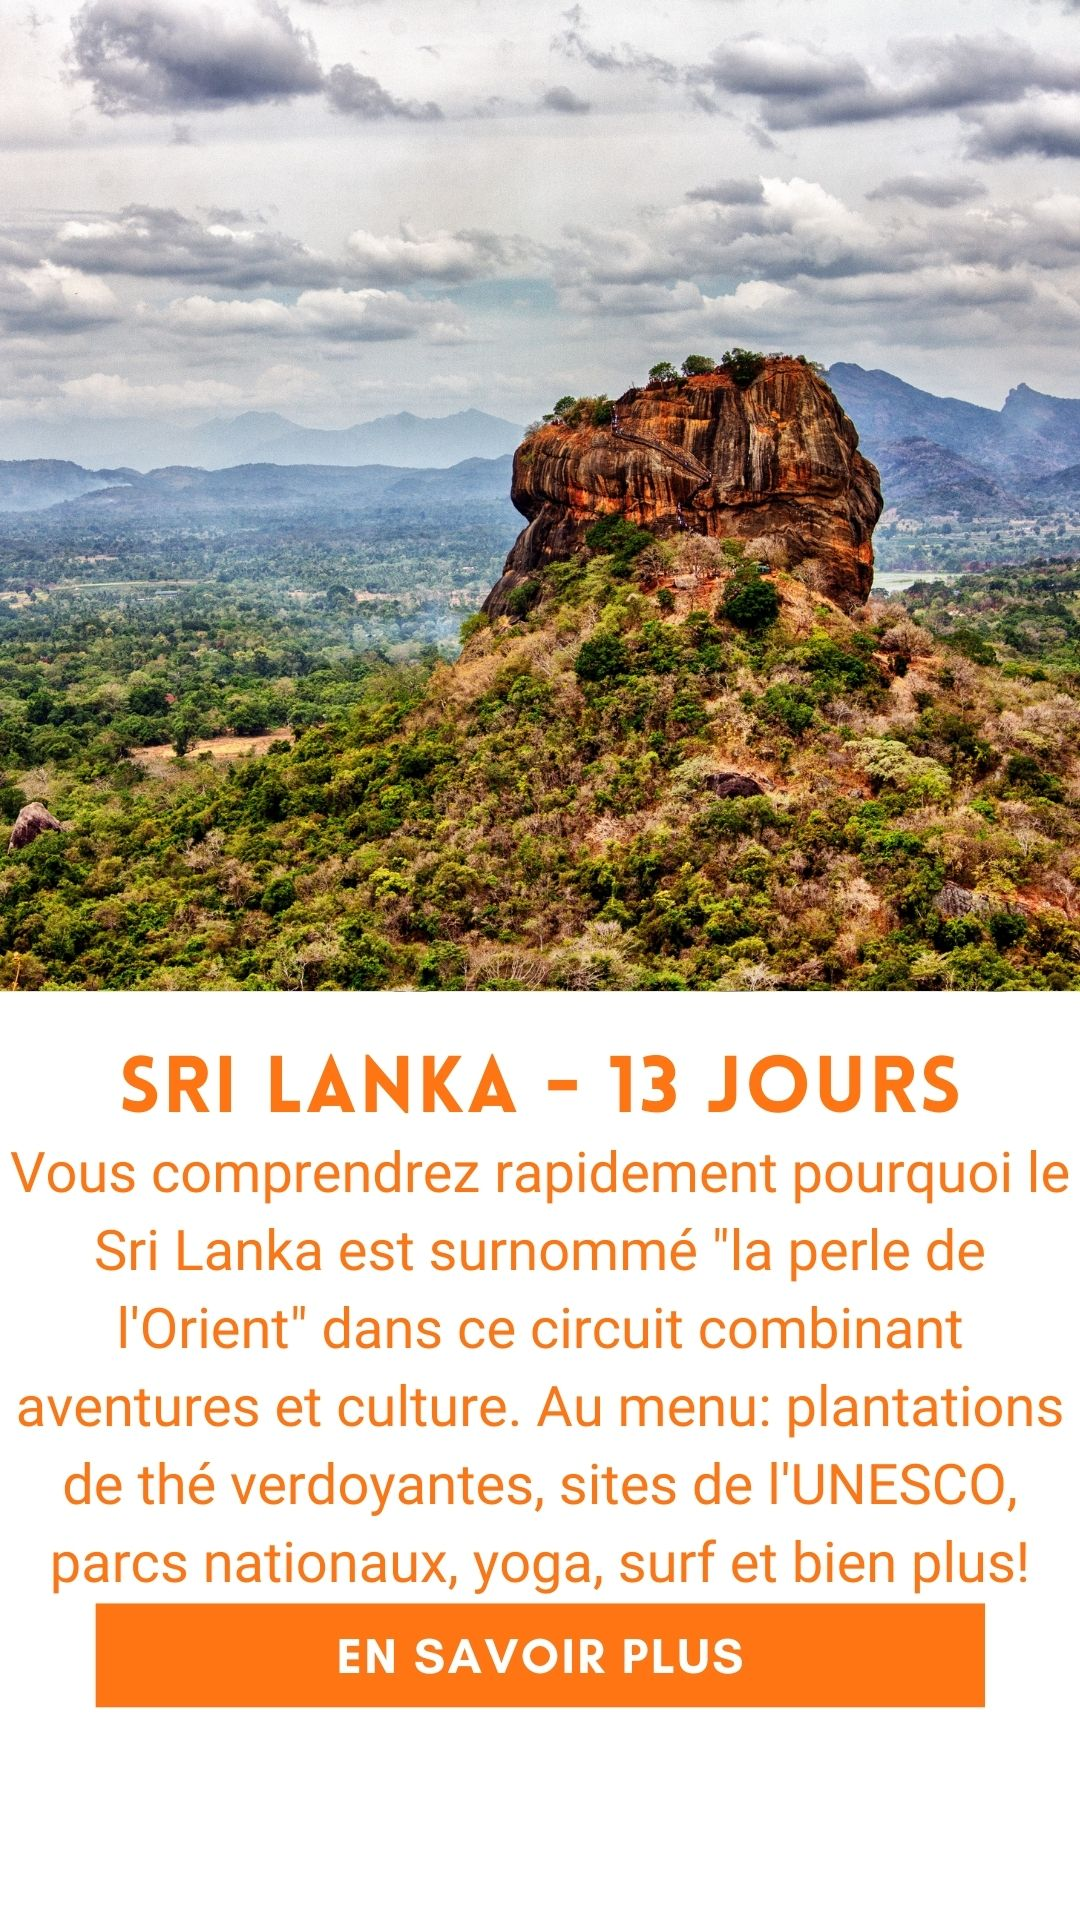 Voyage organisé au Sri Lanka